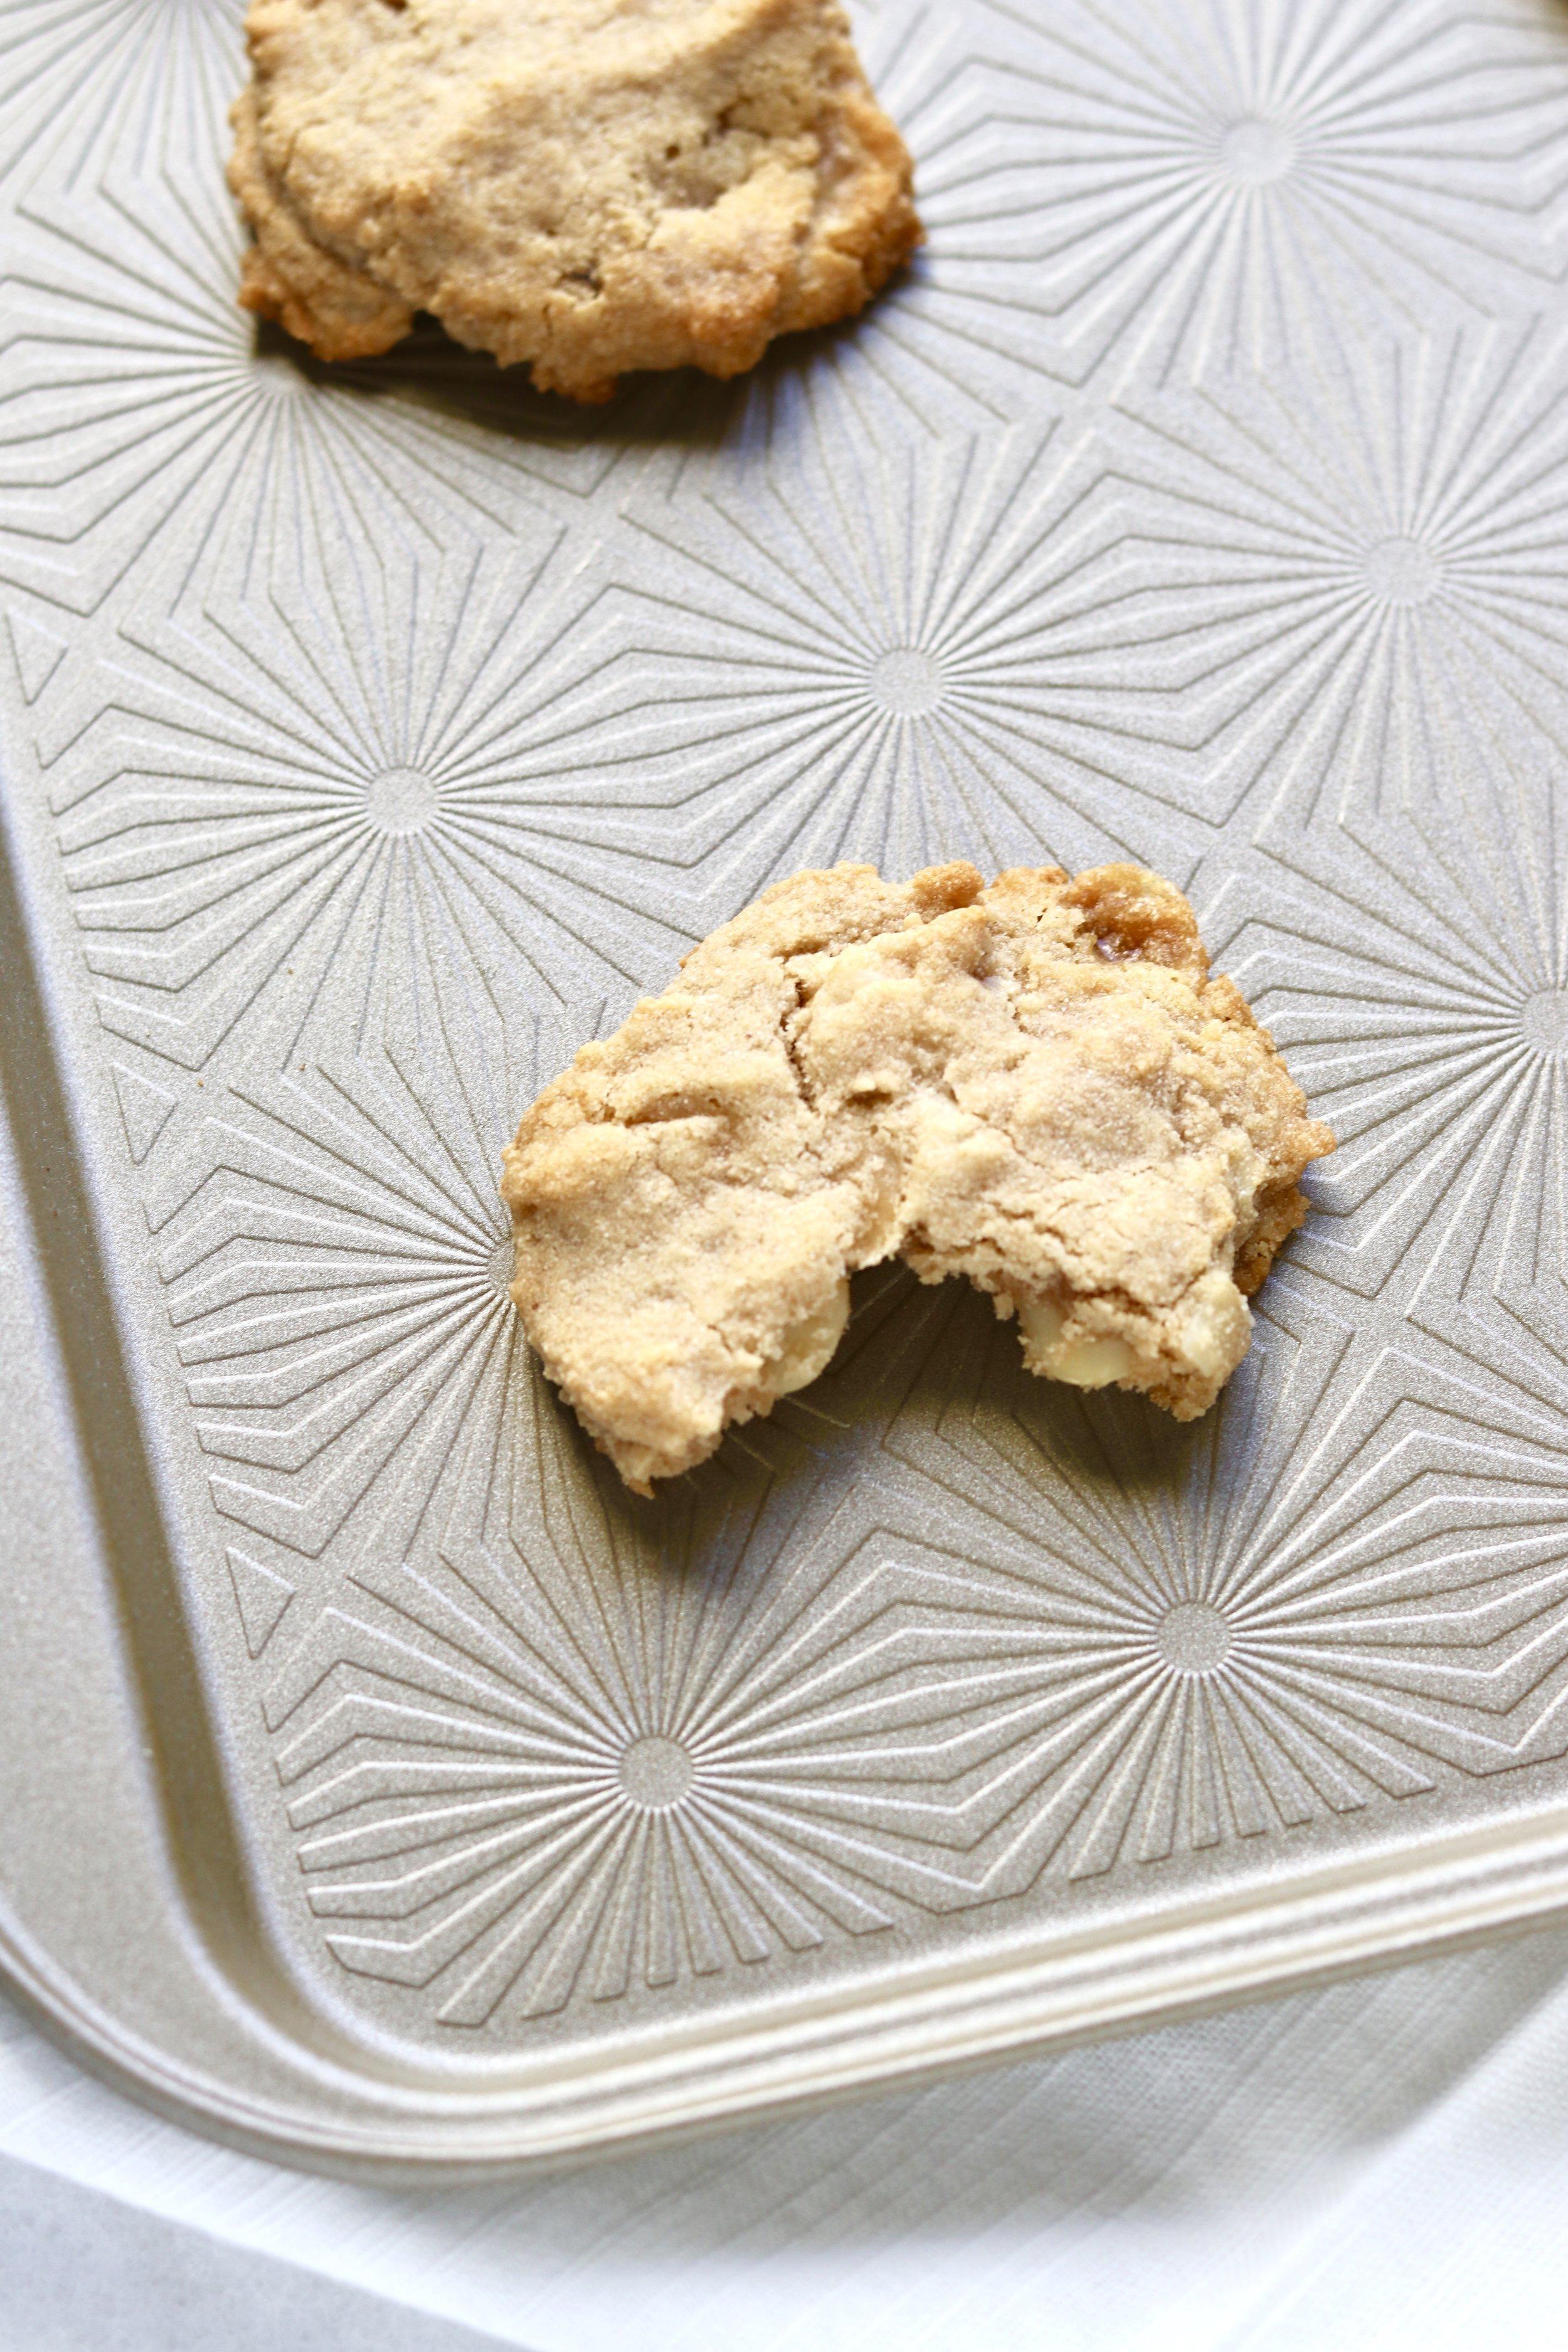 White Chocolate Macadamia Nut Cookies I'd Eat That Food